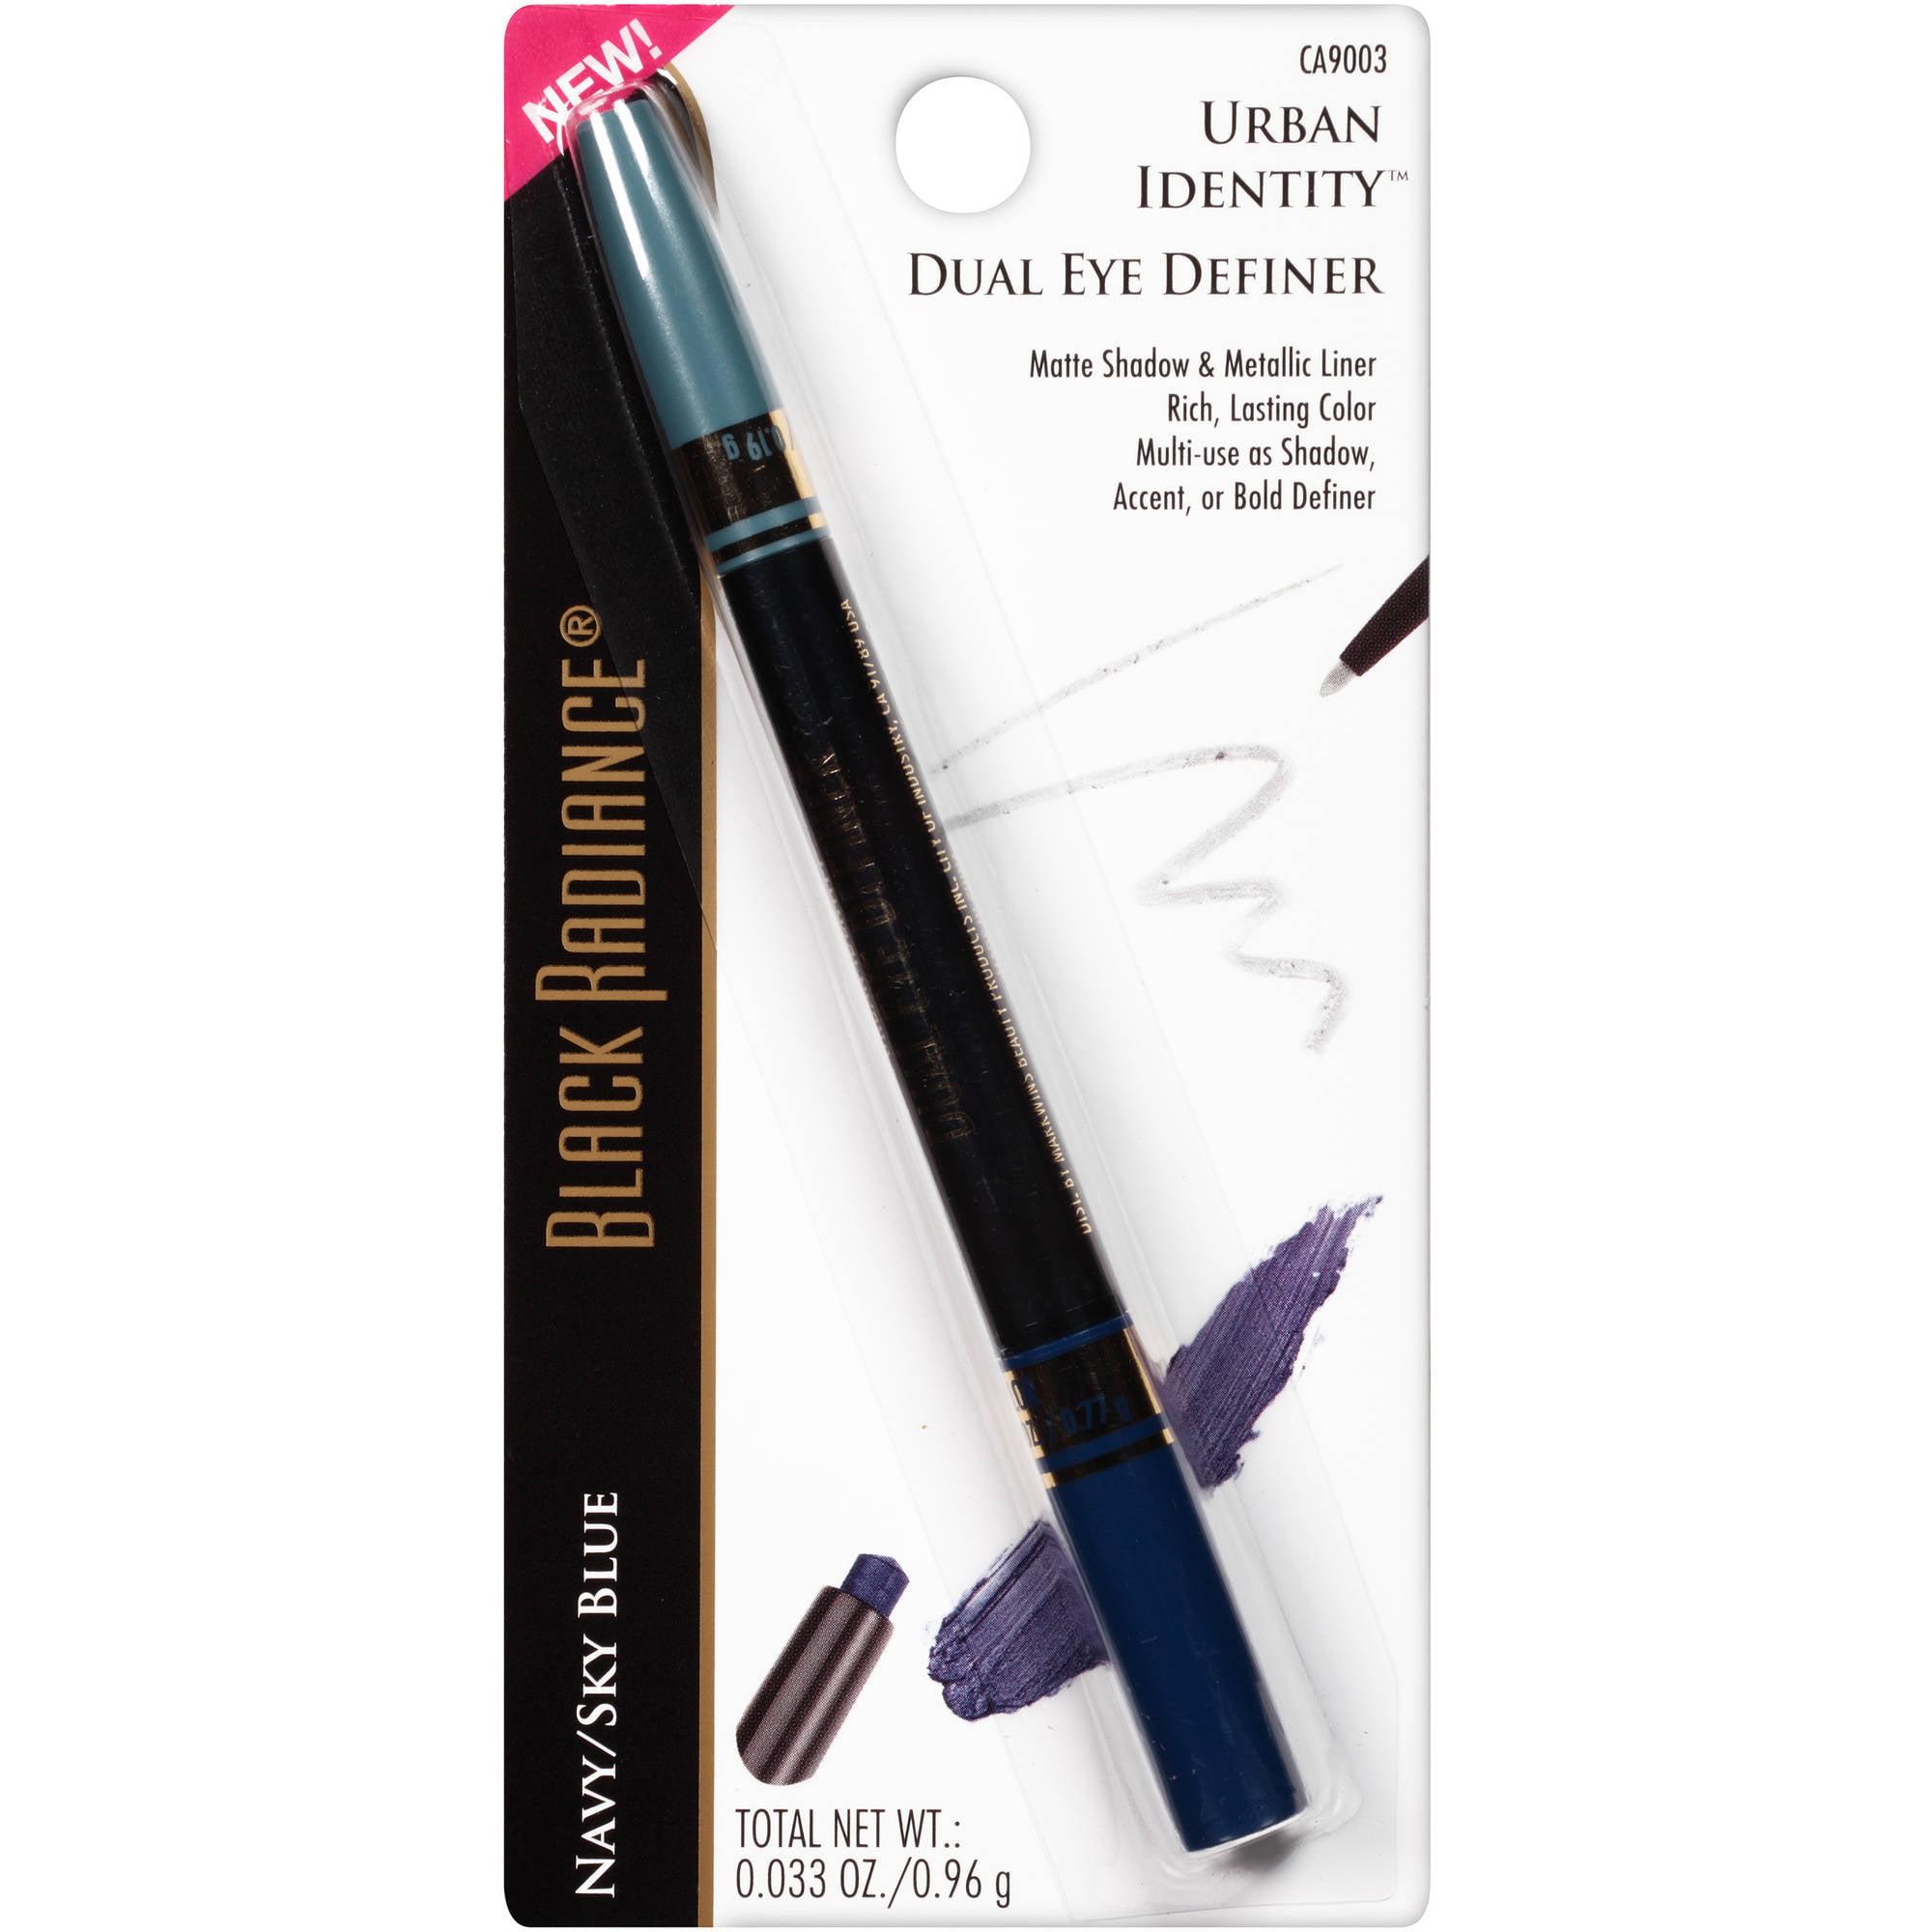 Black Radiance Urban Identity Dual Eye Definer, CA9003 Navy/Sky Blue, 0.033 oz